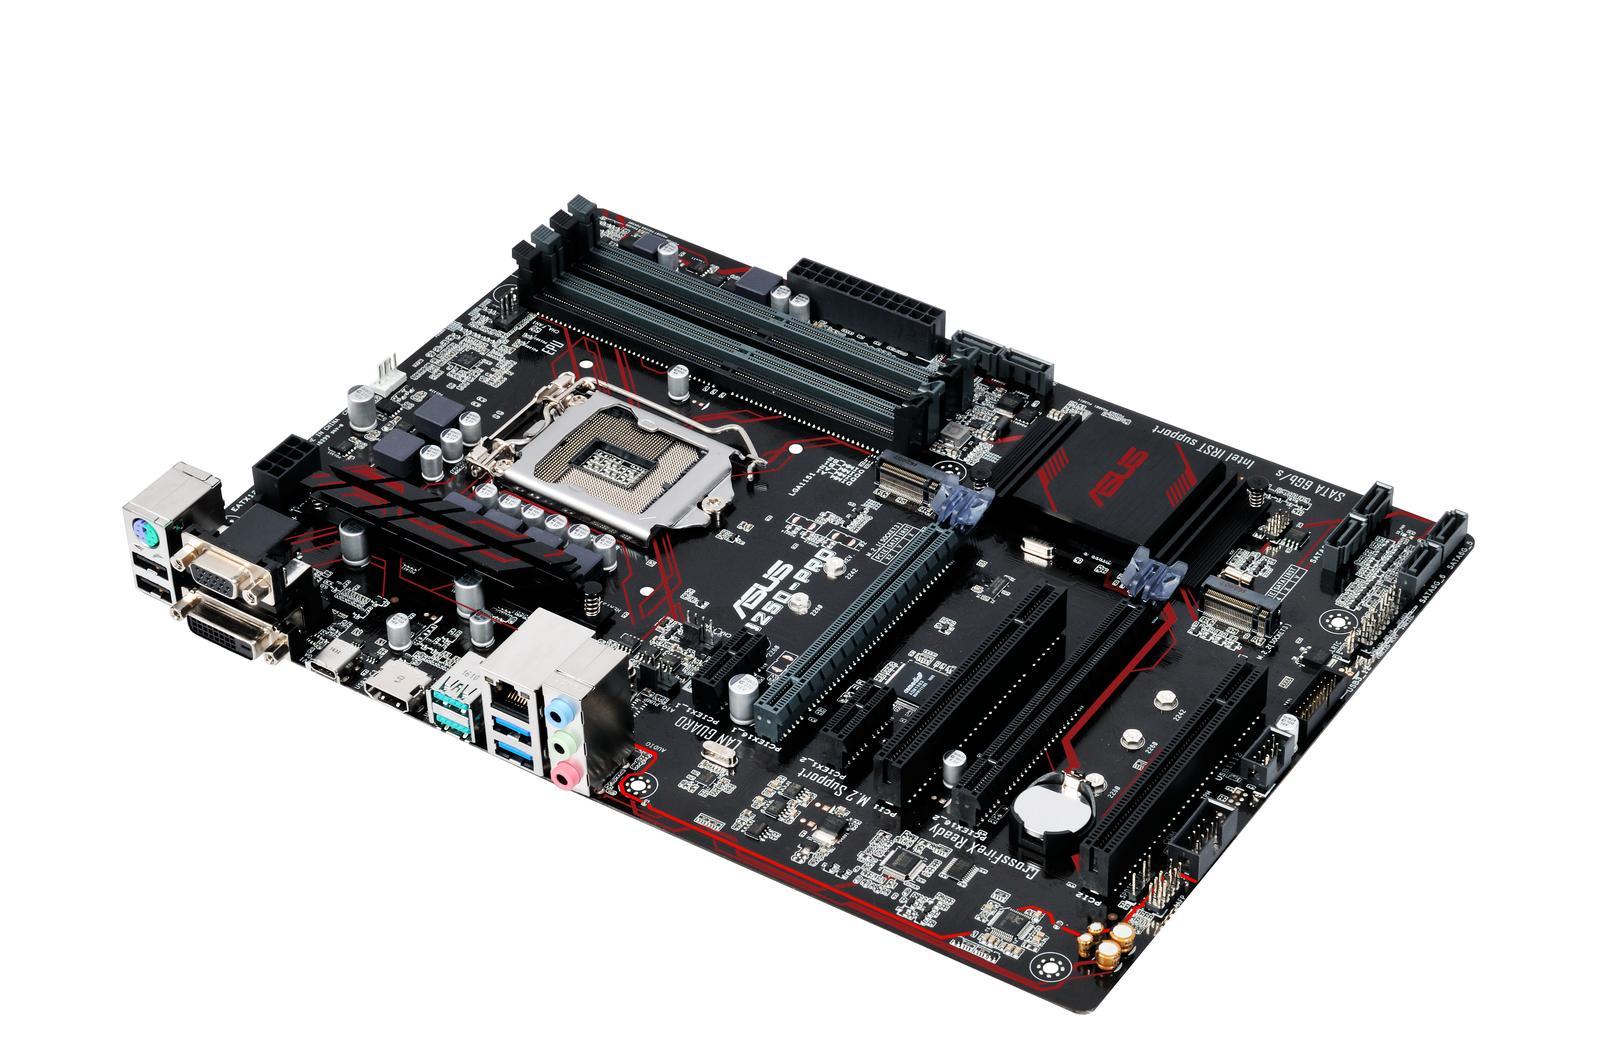 Asus PRIME B250-PRO ATX LGA 1151